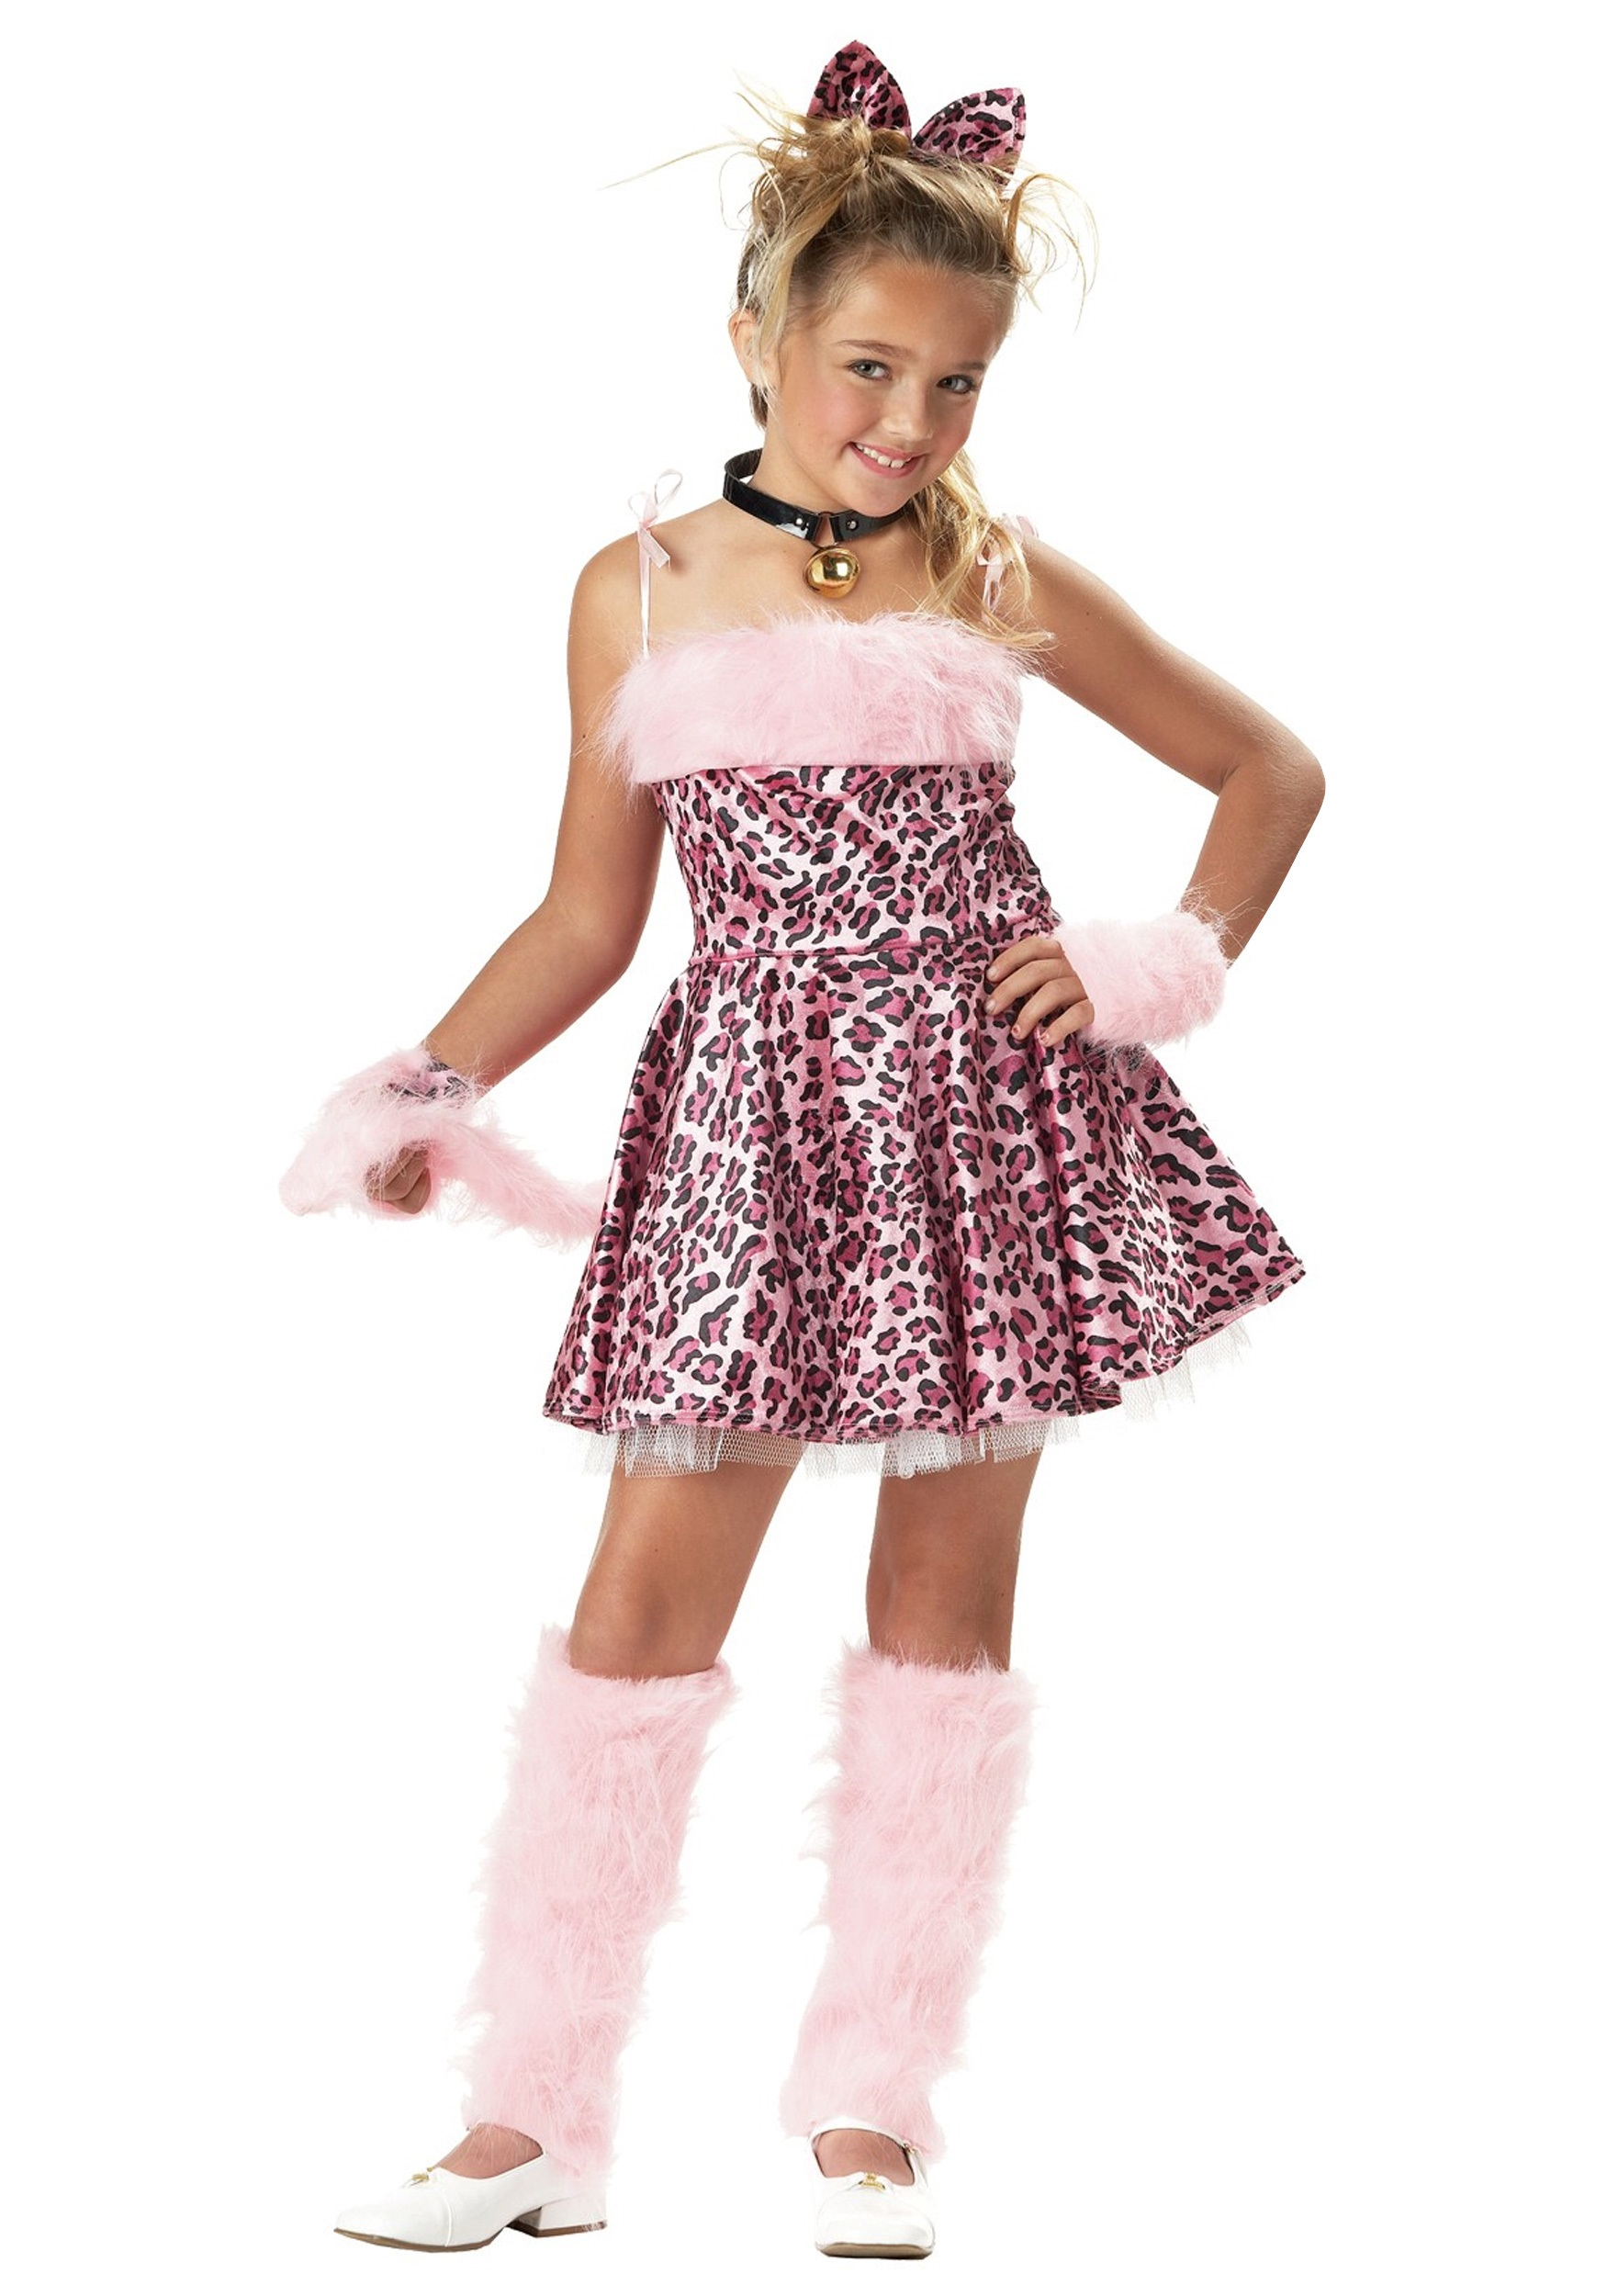 Girlu0027s Pink Cat Costume  sc 1 st  Halloween Costumes & Girlu0027s Pink Cat Costume - Halloween Costumes